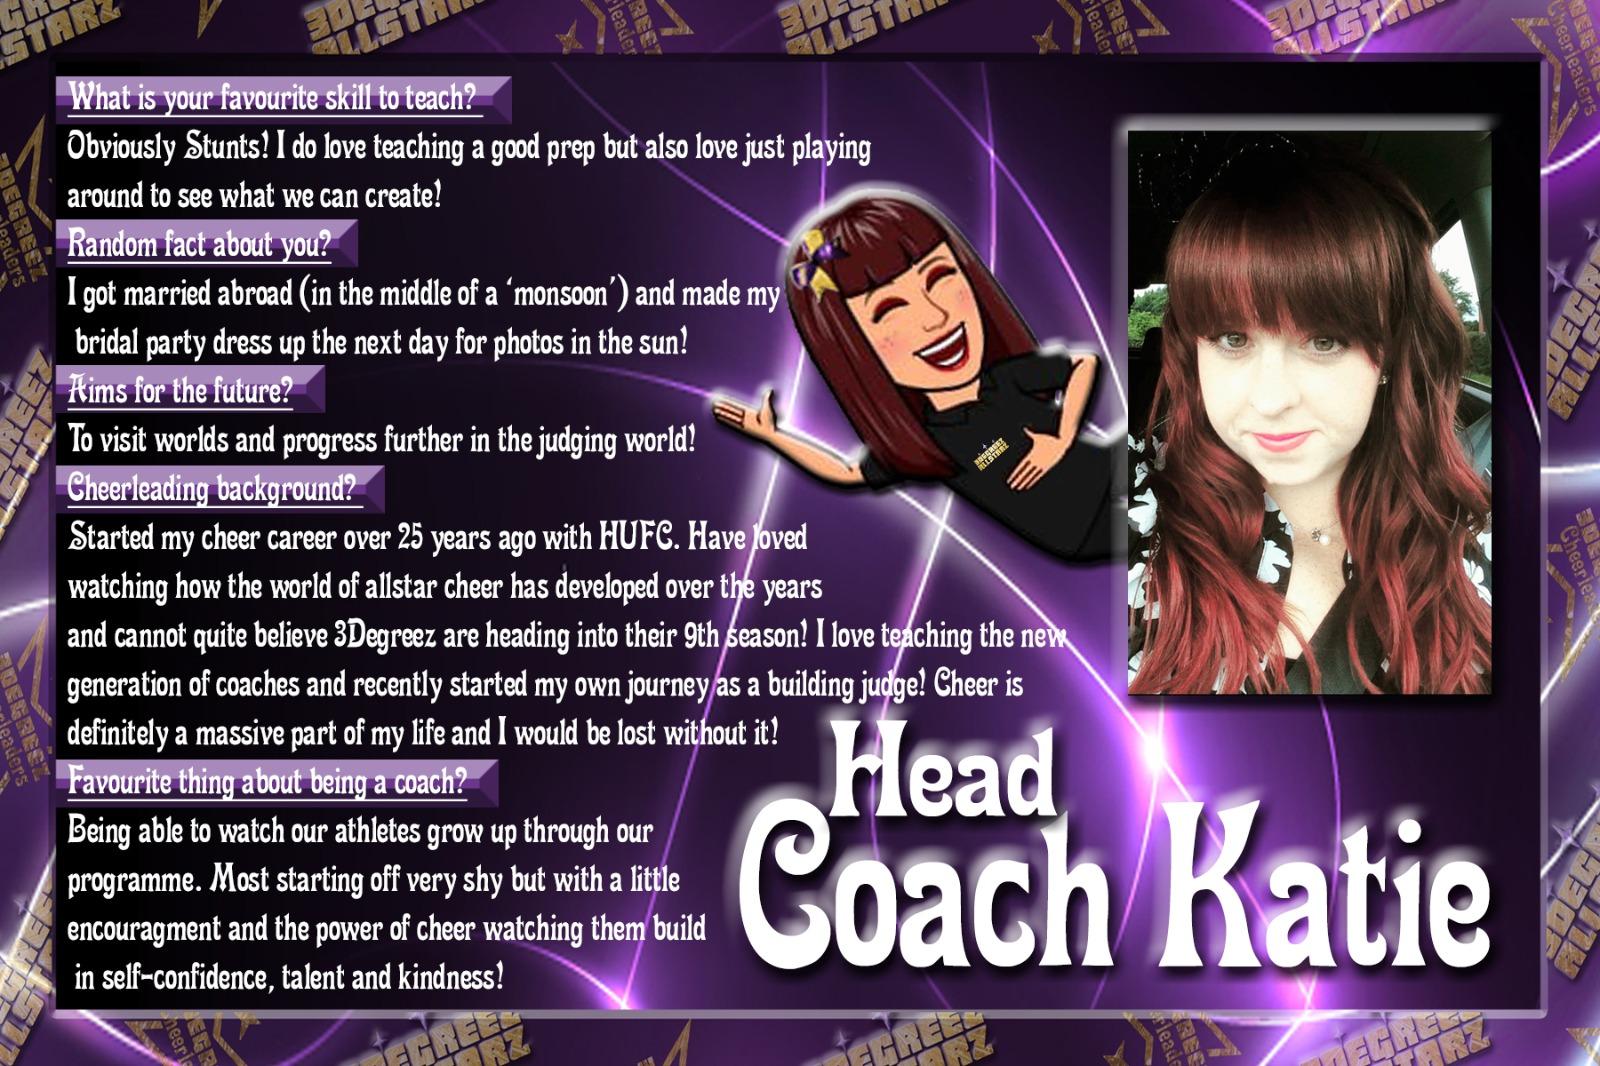 Head Coach Katie